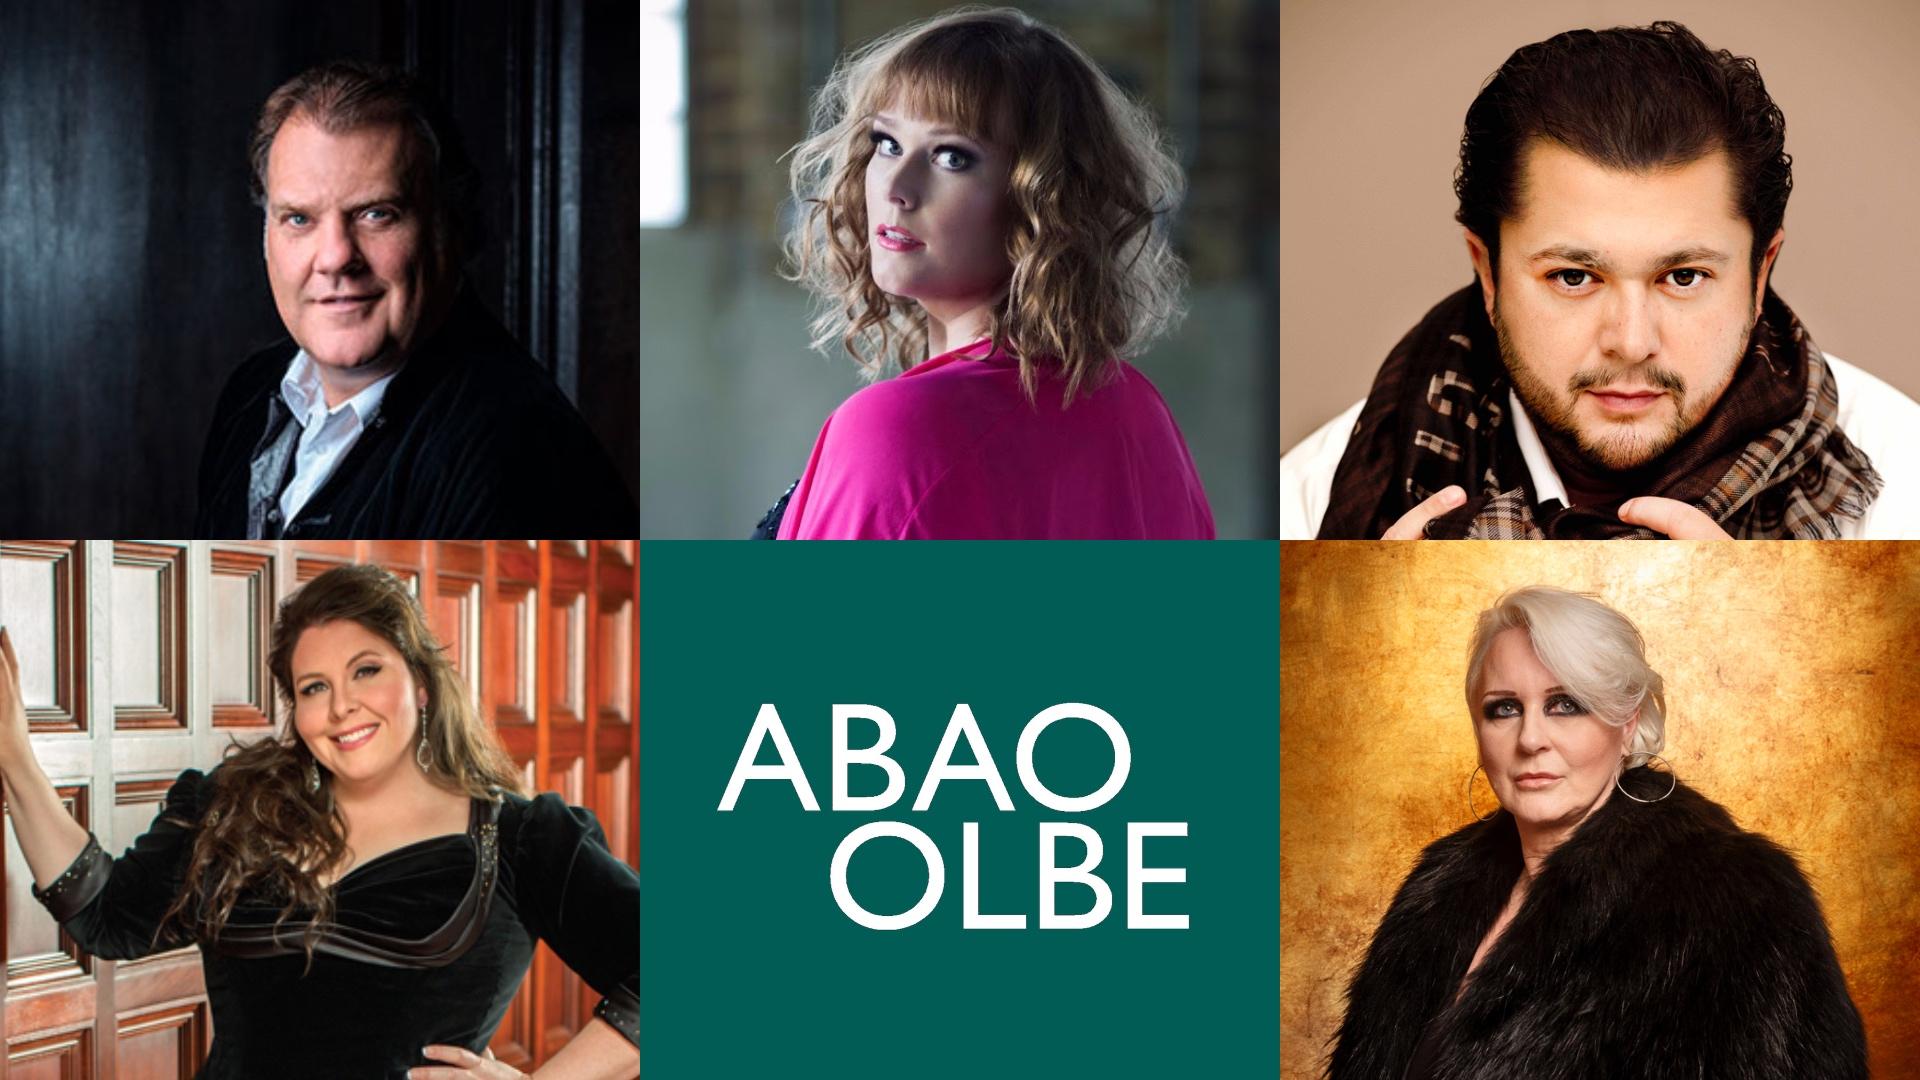 YoSoyABAO; ABAO OLBE; Bilbao; Bryn Terfel; Jessica Pratt; Celso Albelo; Angela Meade; Irene Theorin; Opera 19/20